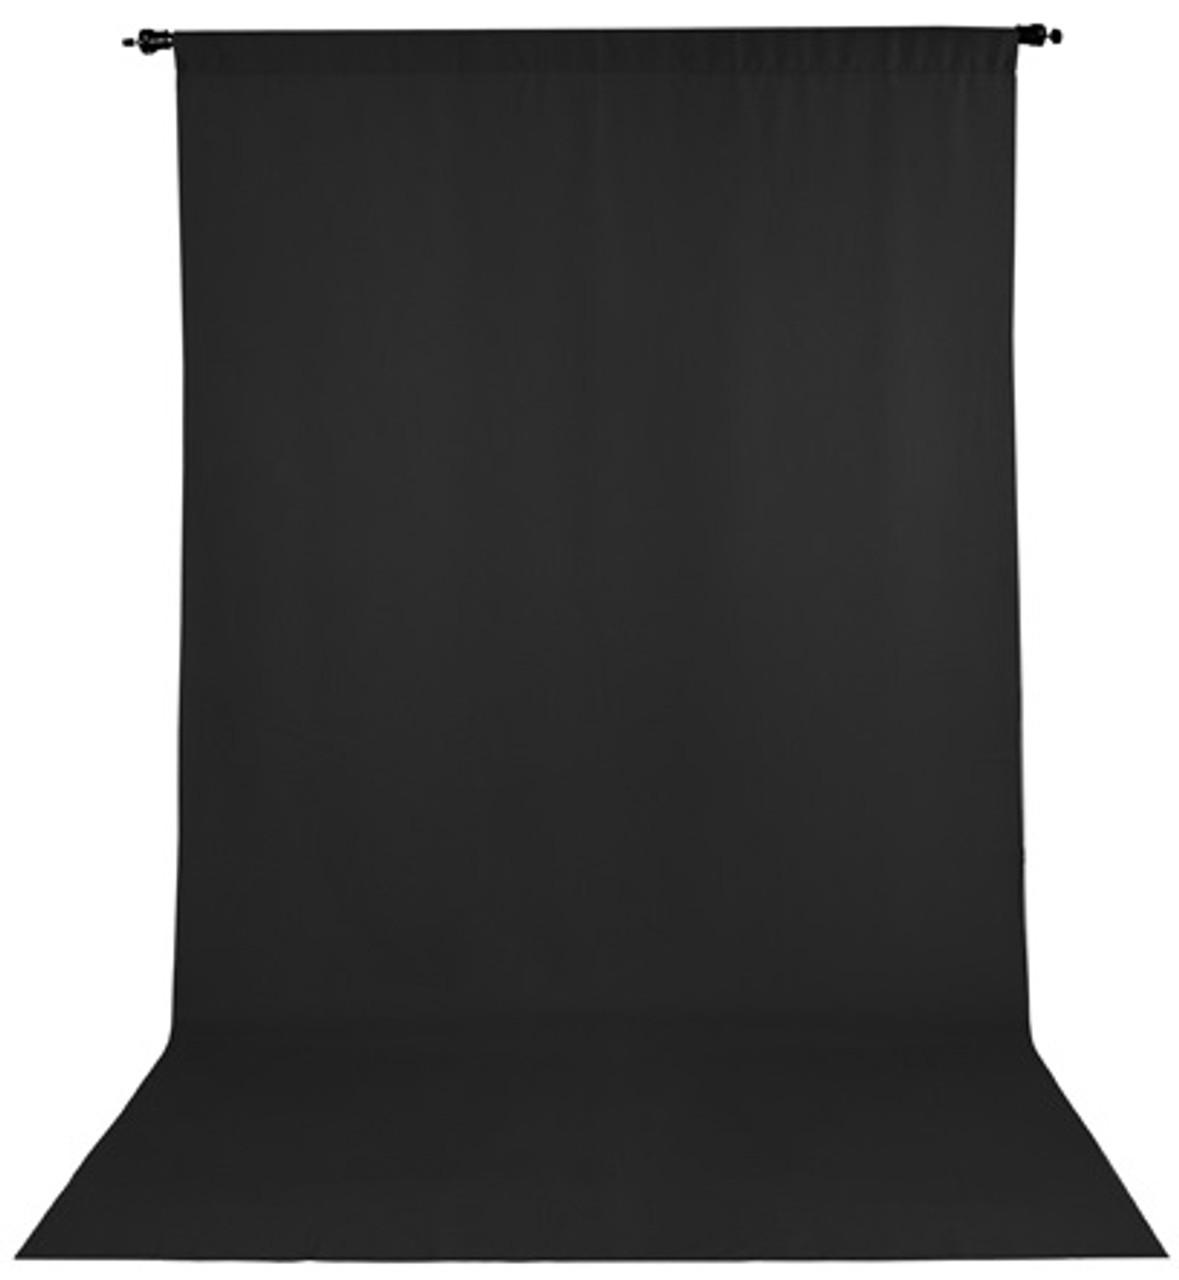 ProMaster Wrinkle Resistant Backdrop 10'x12' - Black